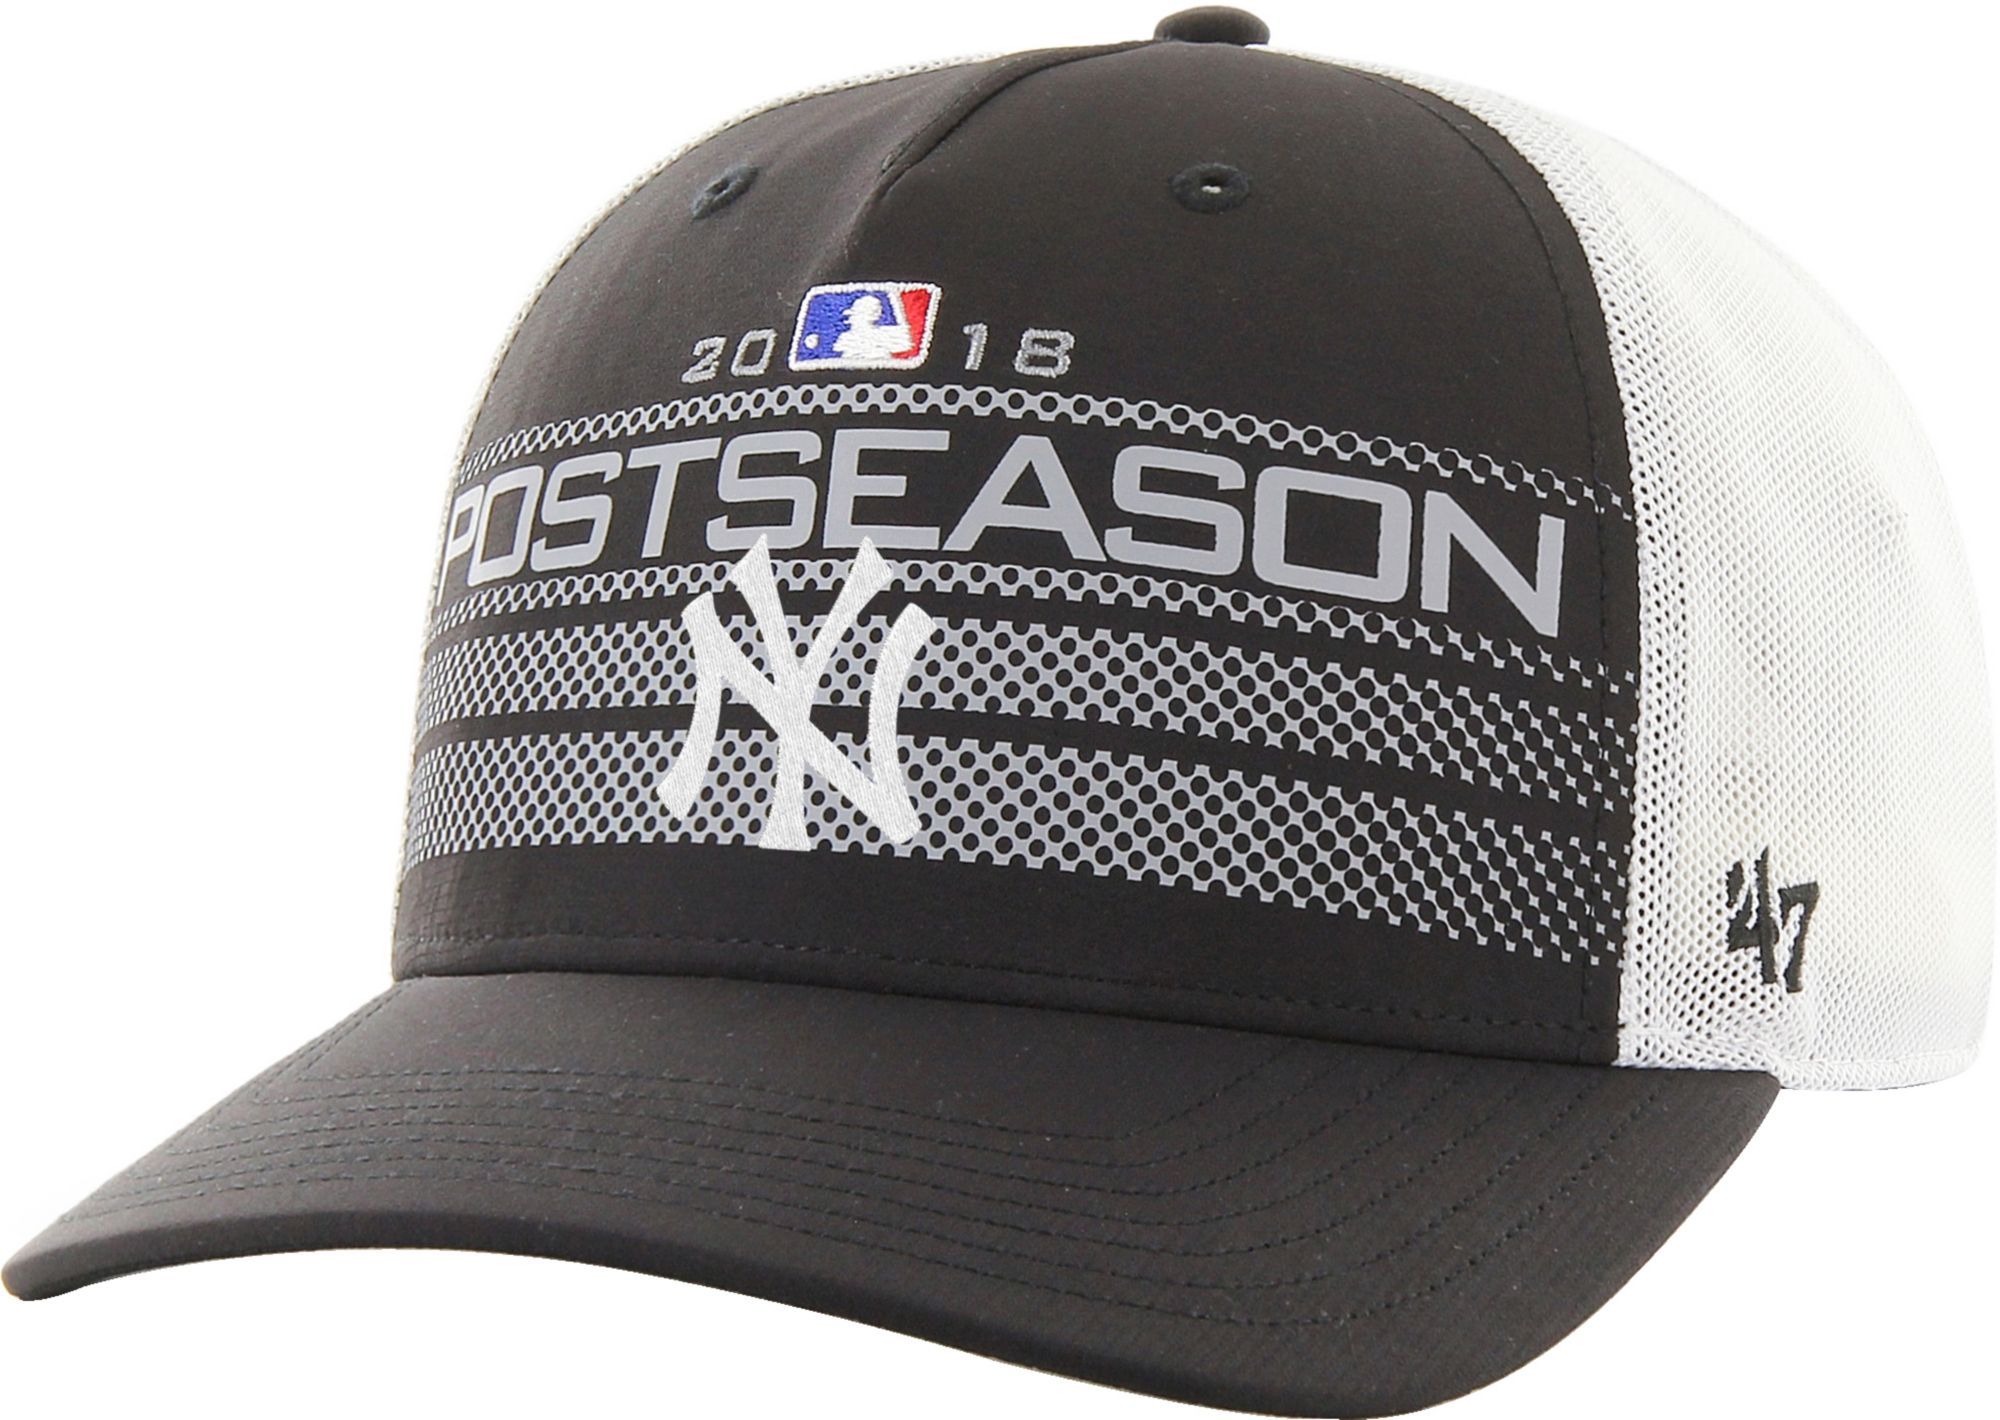 a61b20dcc8e ... canada 47 mens new york yankees 2018 mlb postseason locker room  adjustable hat 8067f 146c6